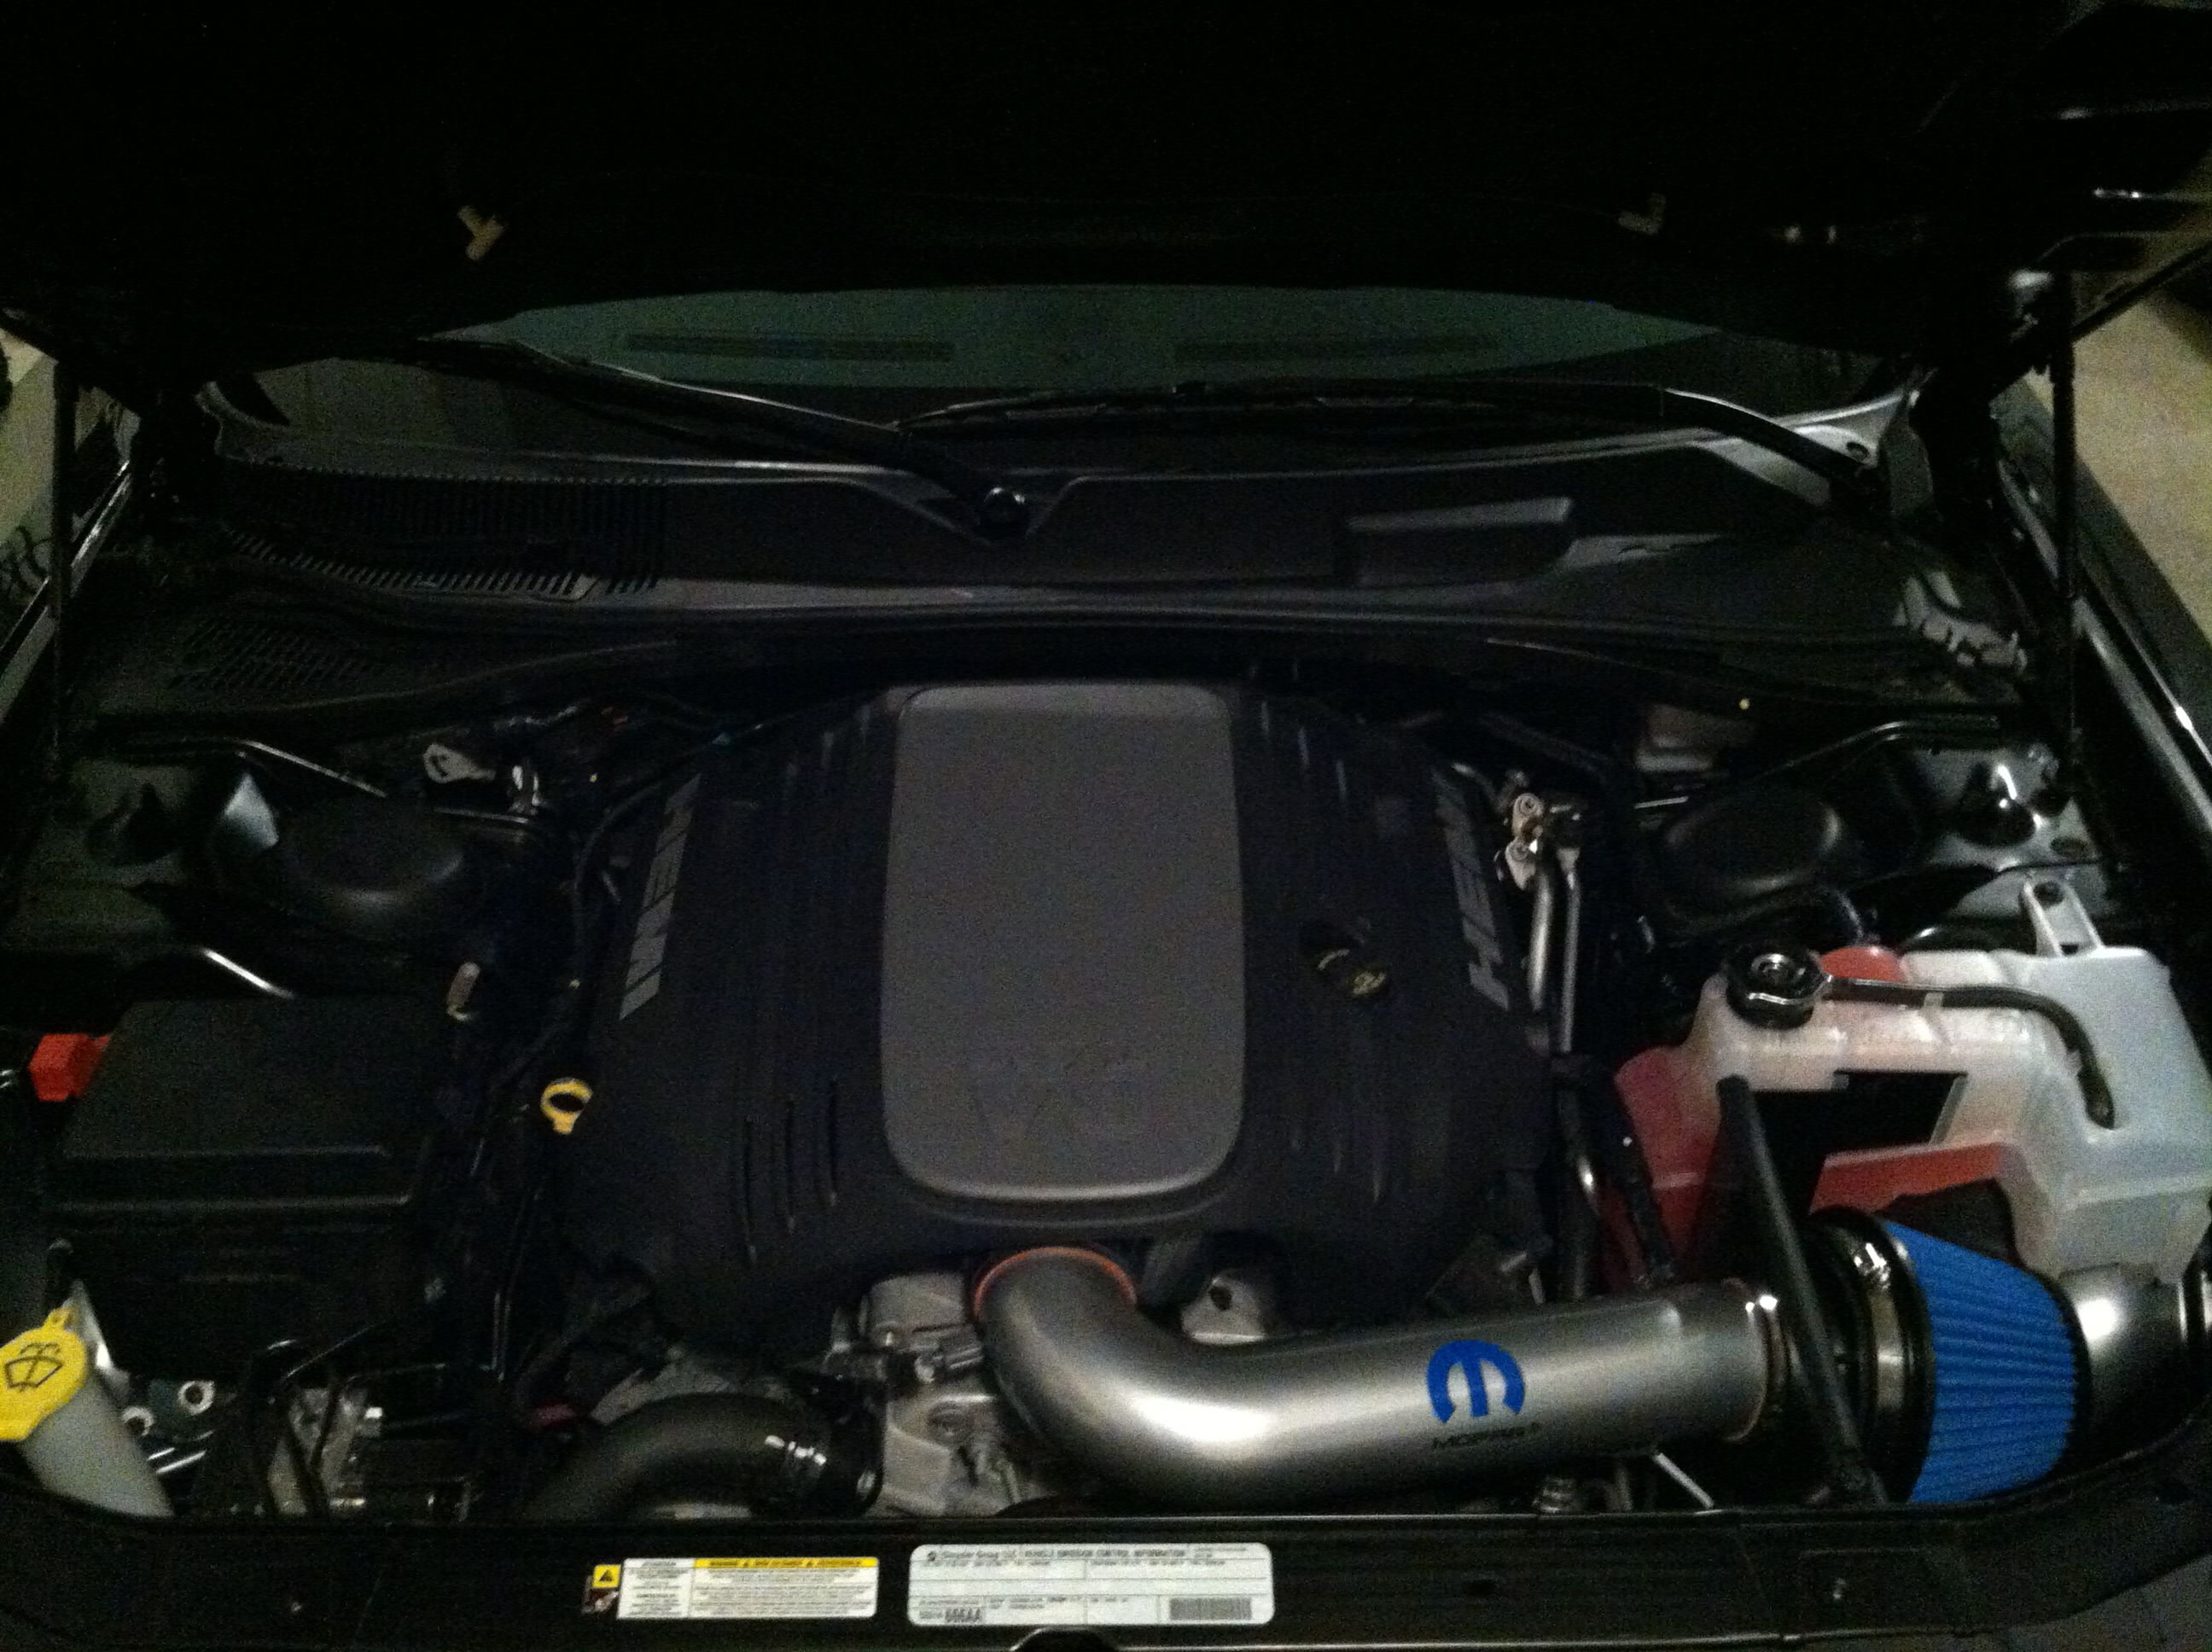 2012 Dodge Challenger 5 7l V8 Hemi Engine Compartment Mopar Cold Air Intake And Ta Hood Scoop 2012 Dodge Challenger Hemi Engine Dodge Challenger